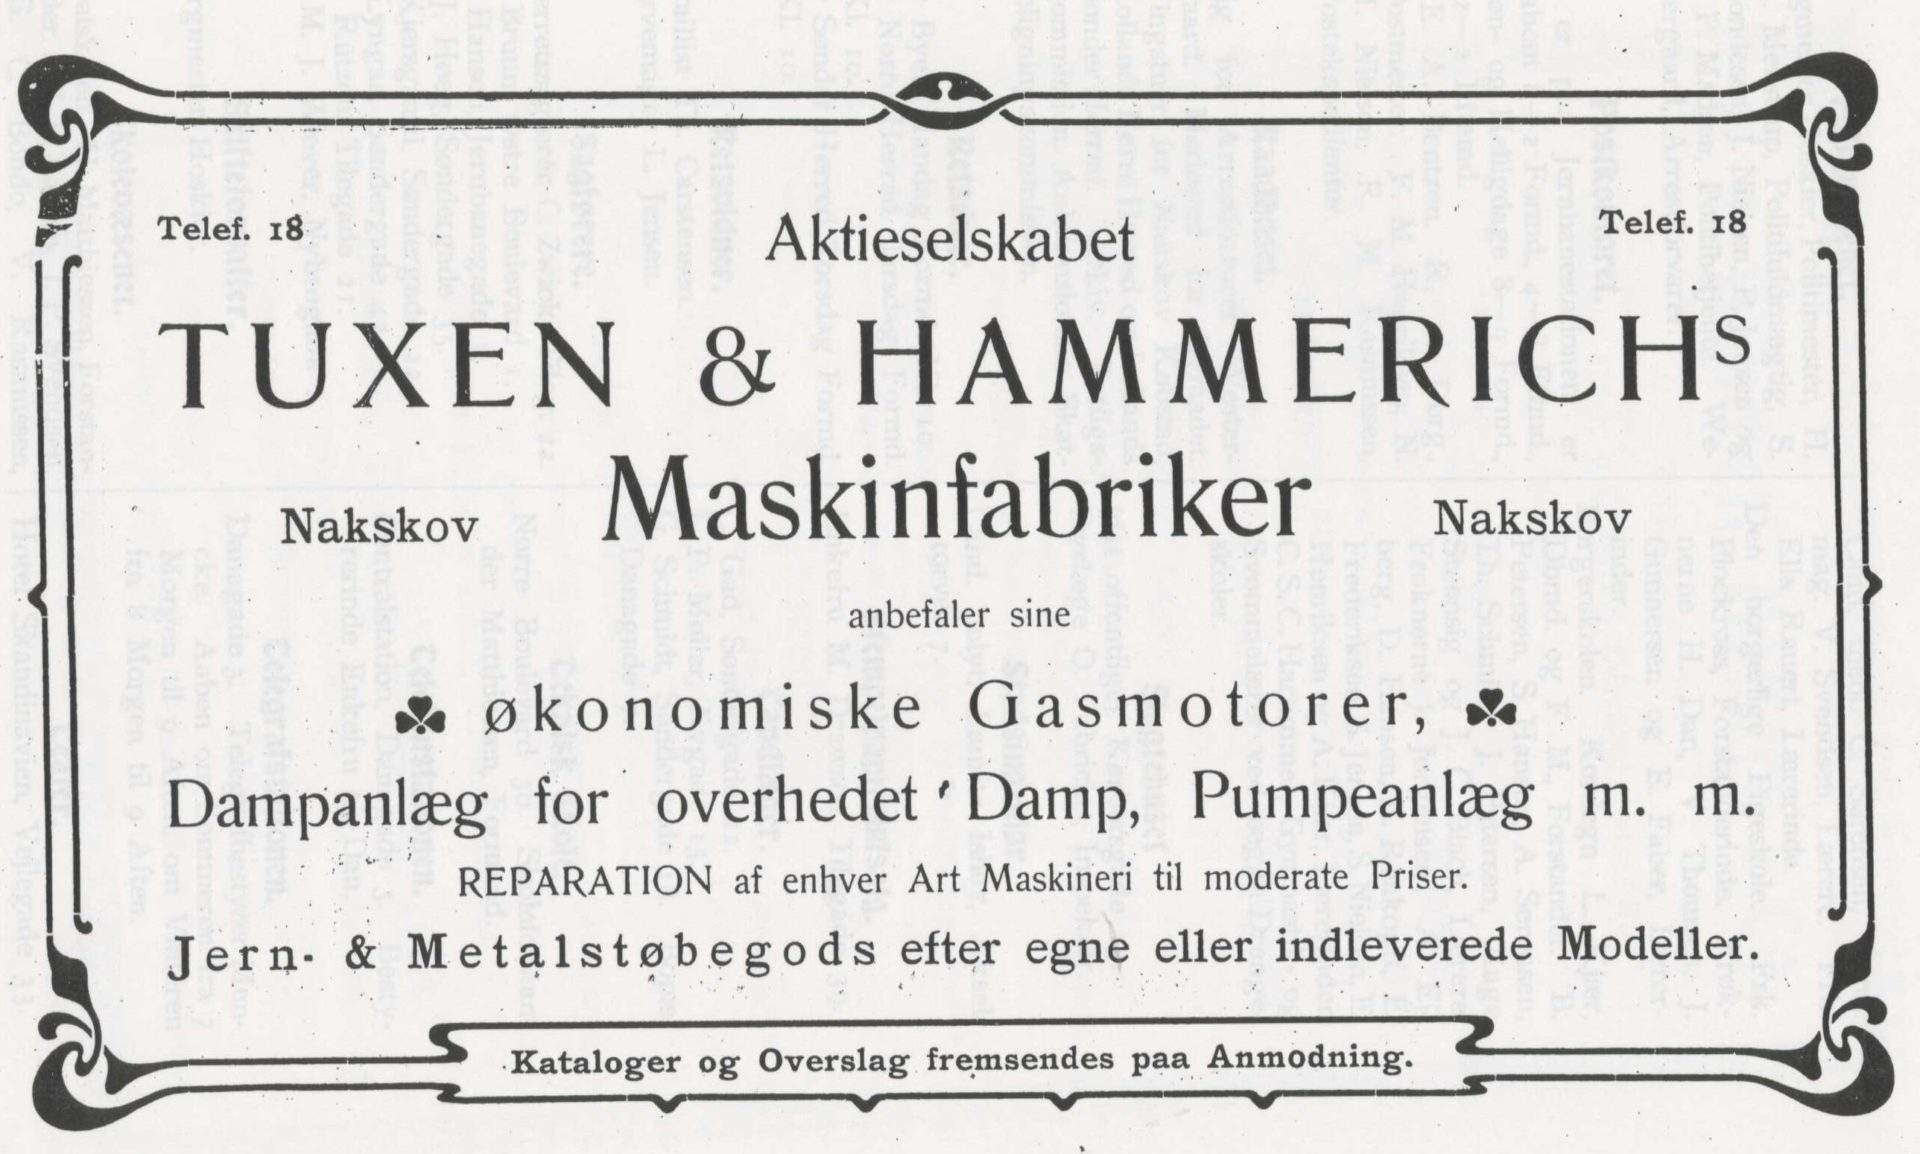 Annonce for Aktieselskabet Tuxen & Hammerichs Maskinfabrikker 1903